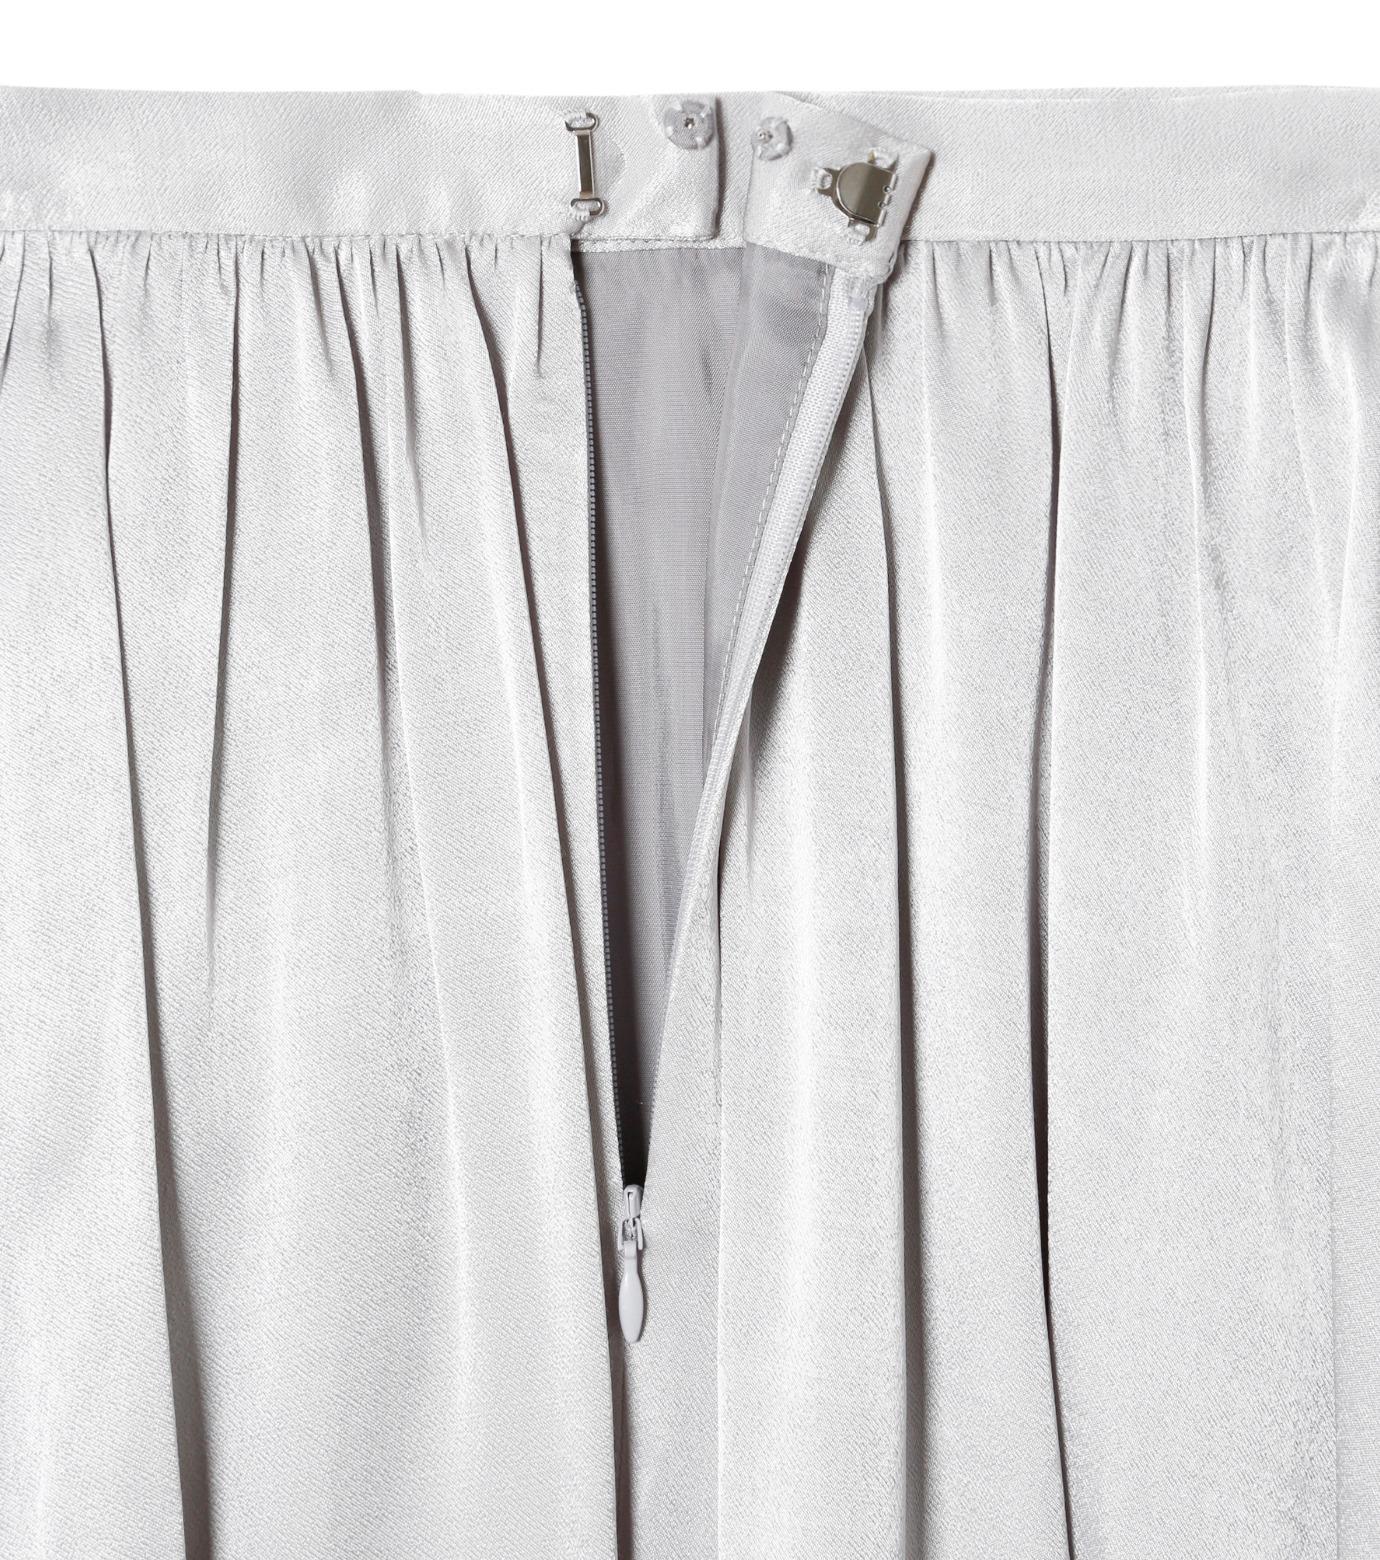 LE CIEL BLEU(ルシェルブルー)のテープギャザリングサテンスカート-GRAY(スカート/skirt)-19S67104 拡大詳細画像5